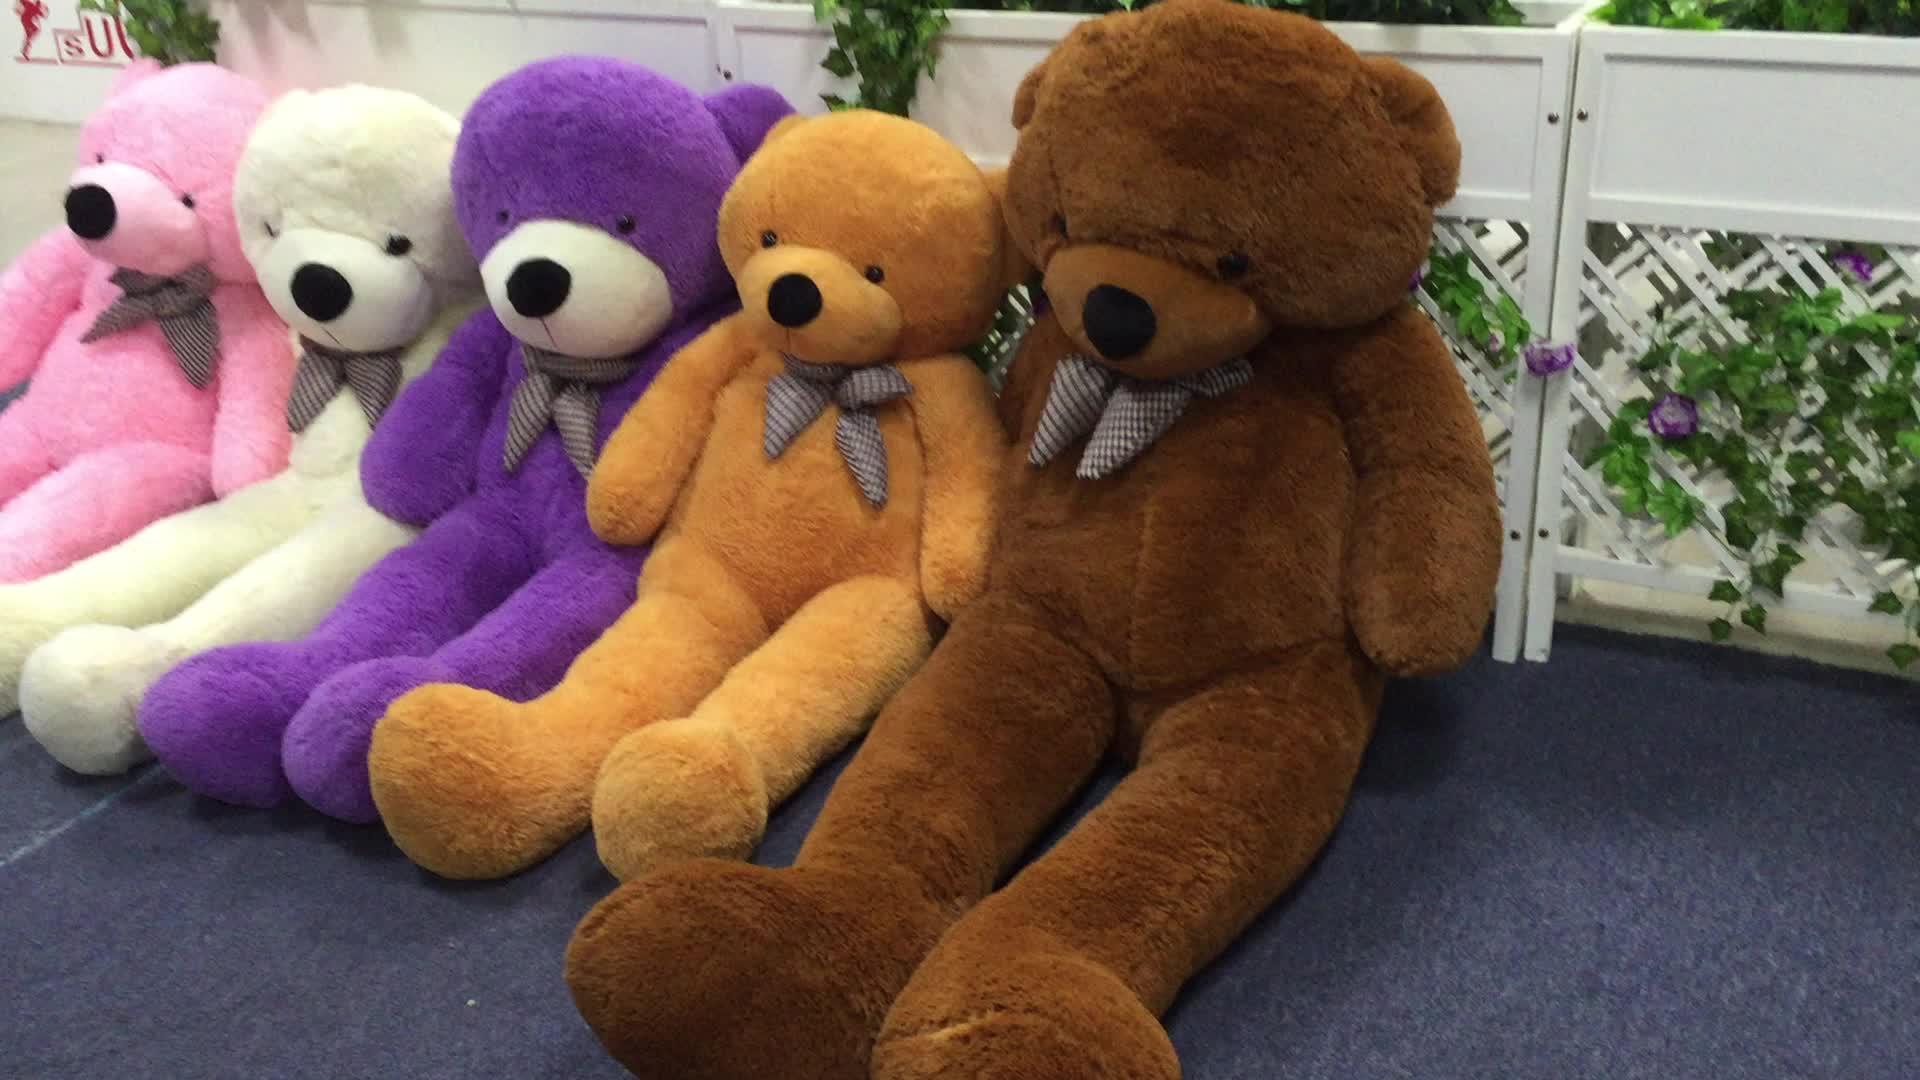 hi ce giant teddy bear for sale plush toys buy giant teddy bear for sale plush toys teddy bear. Black Bedroom Furniture Sets. Home Design Ideas